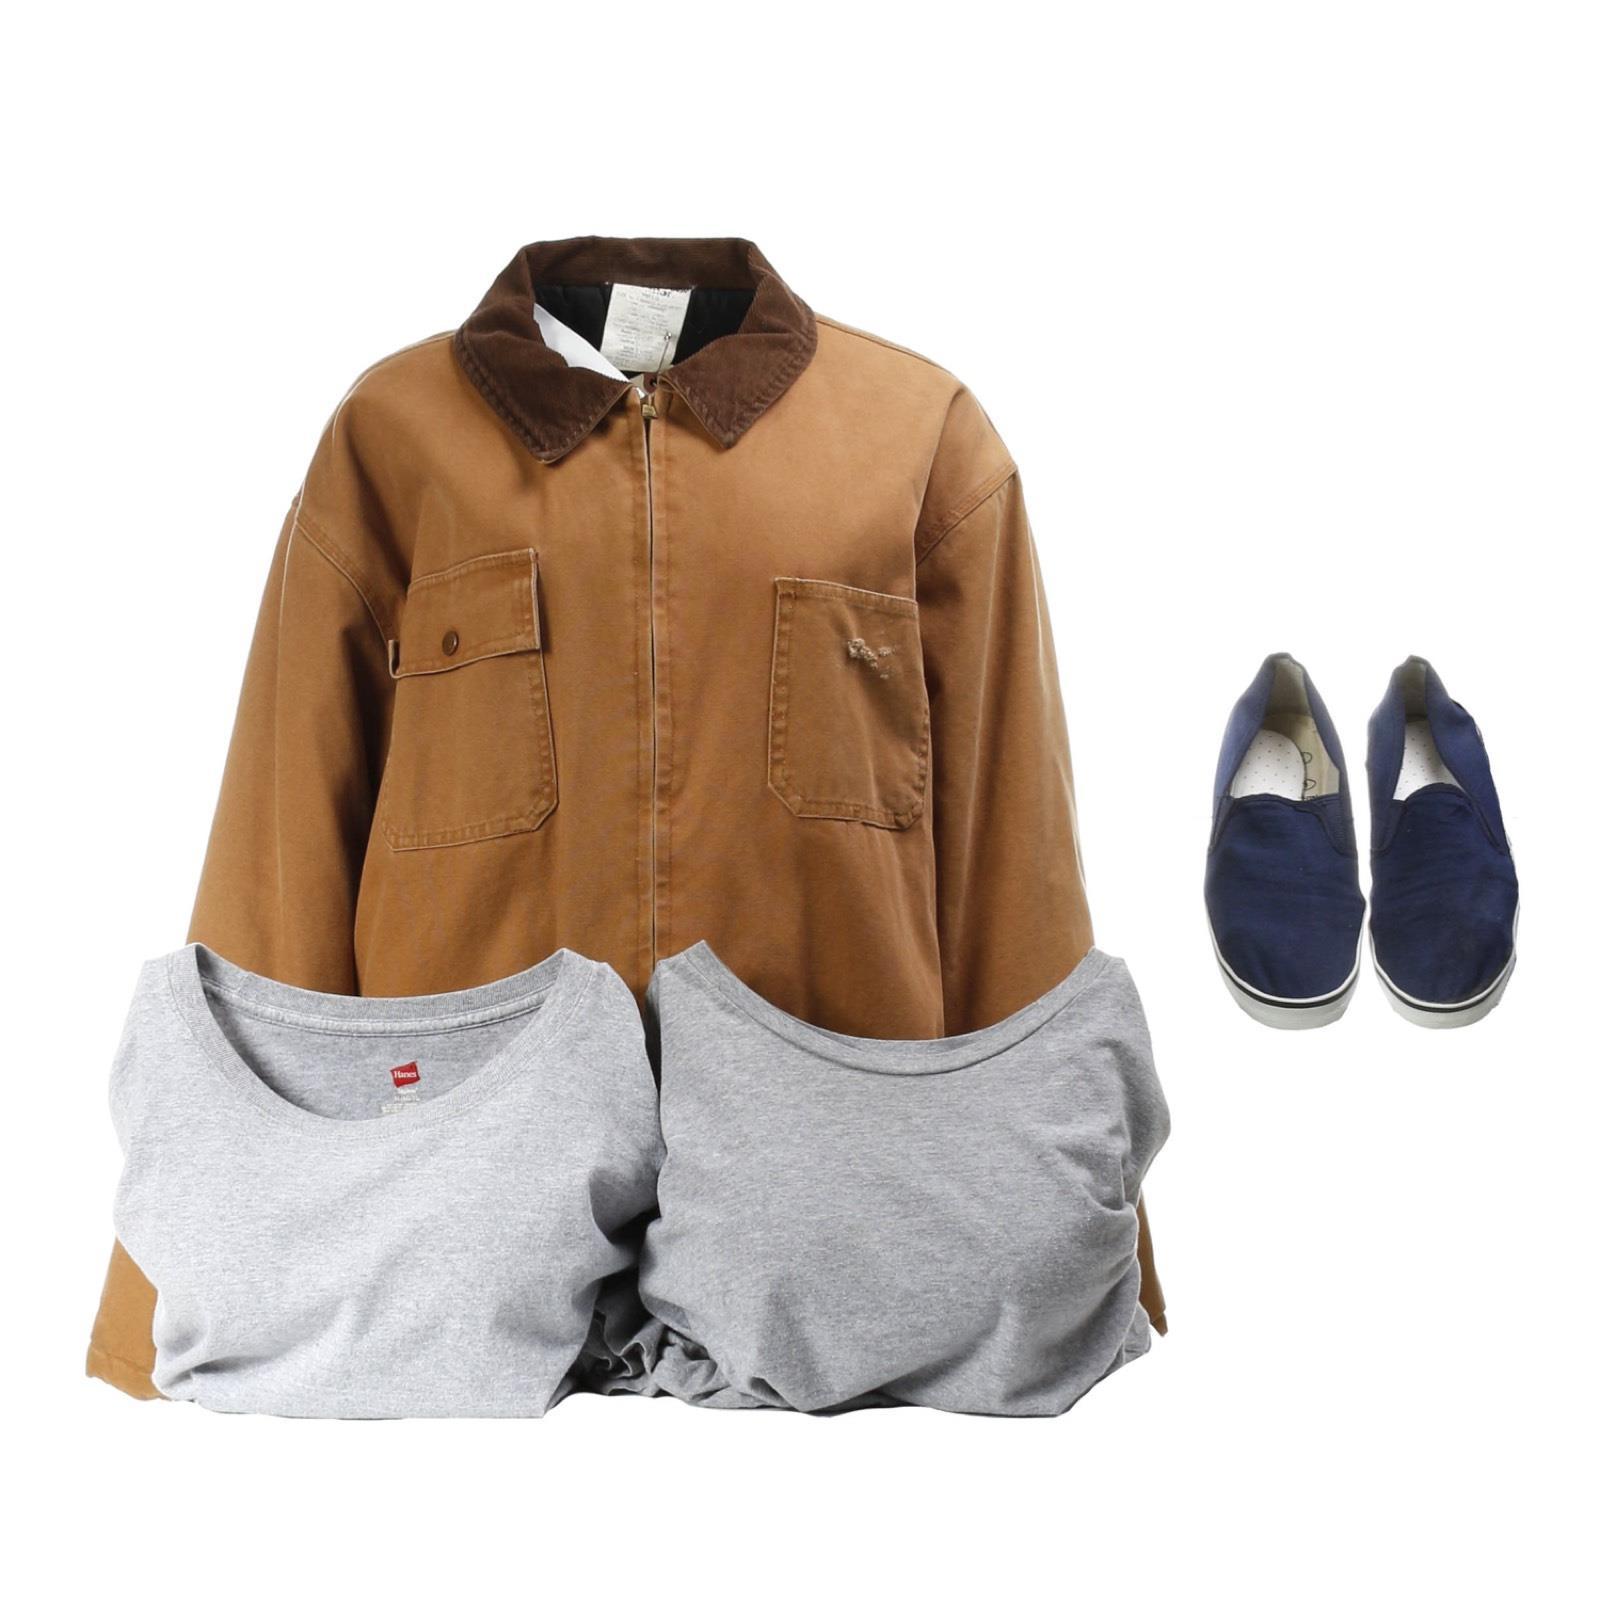 OITNB-Taystee-Danielle-Brooks-Screen-Worn-Coat-Shirt-Set-amp-Shoes-Ss-4-6